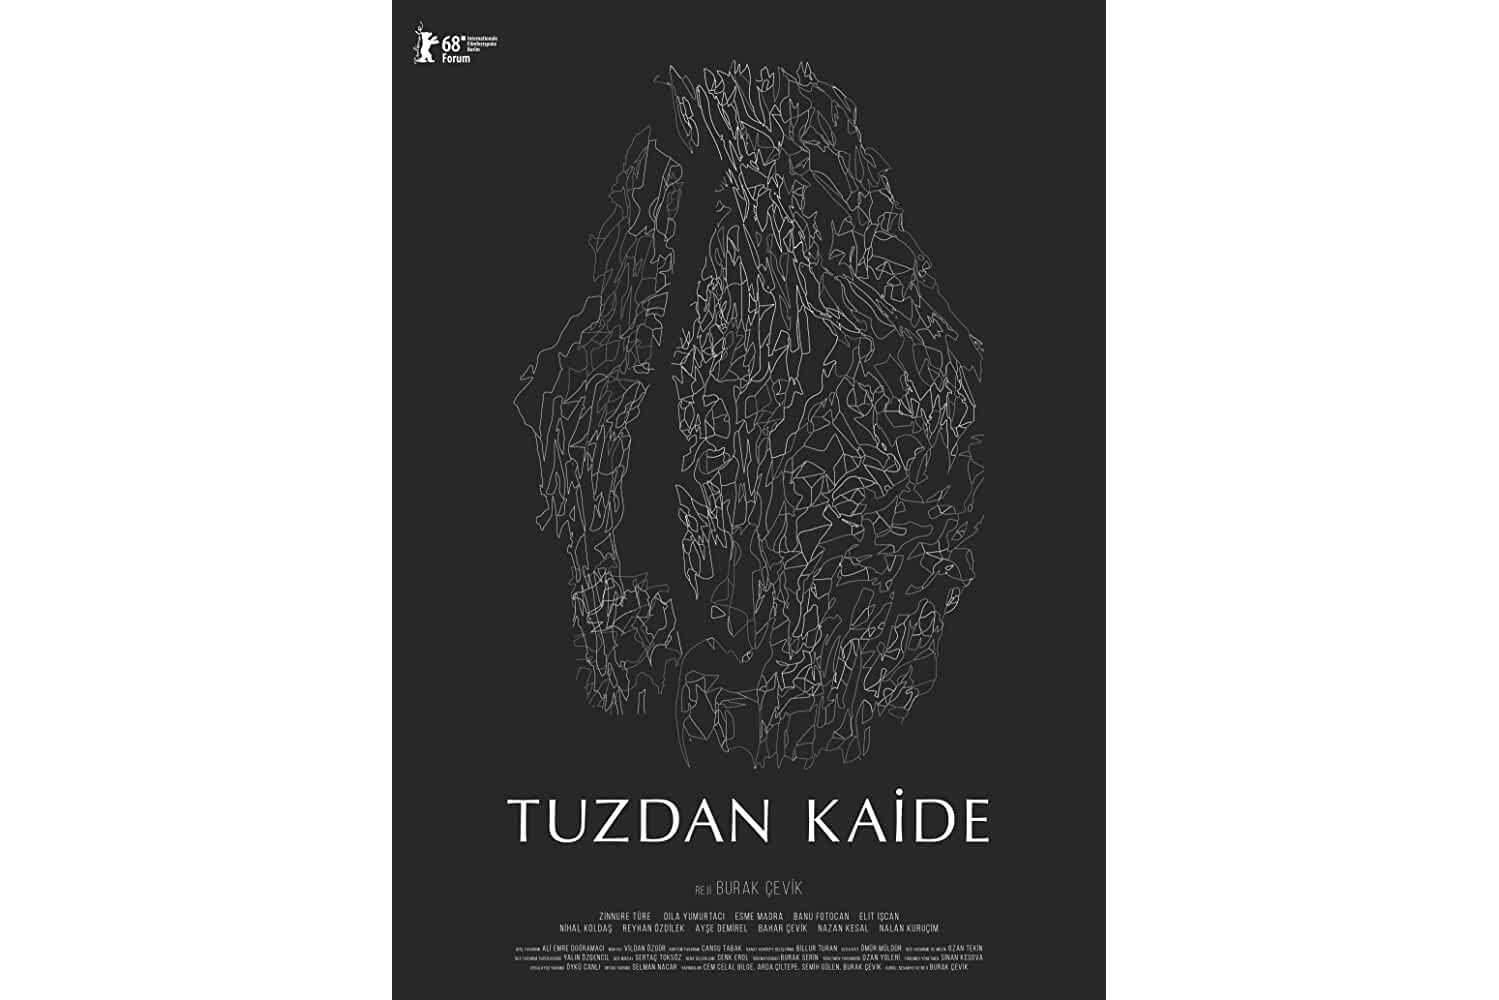 Tuzdan Kaide (2018)